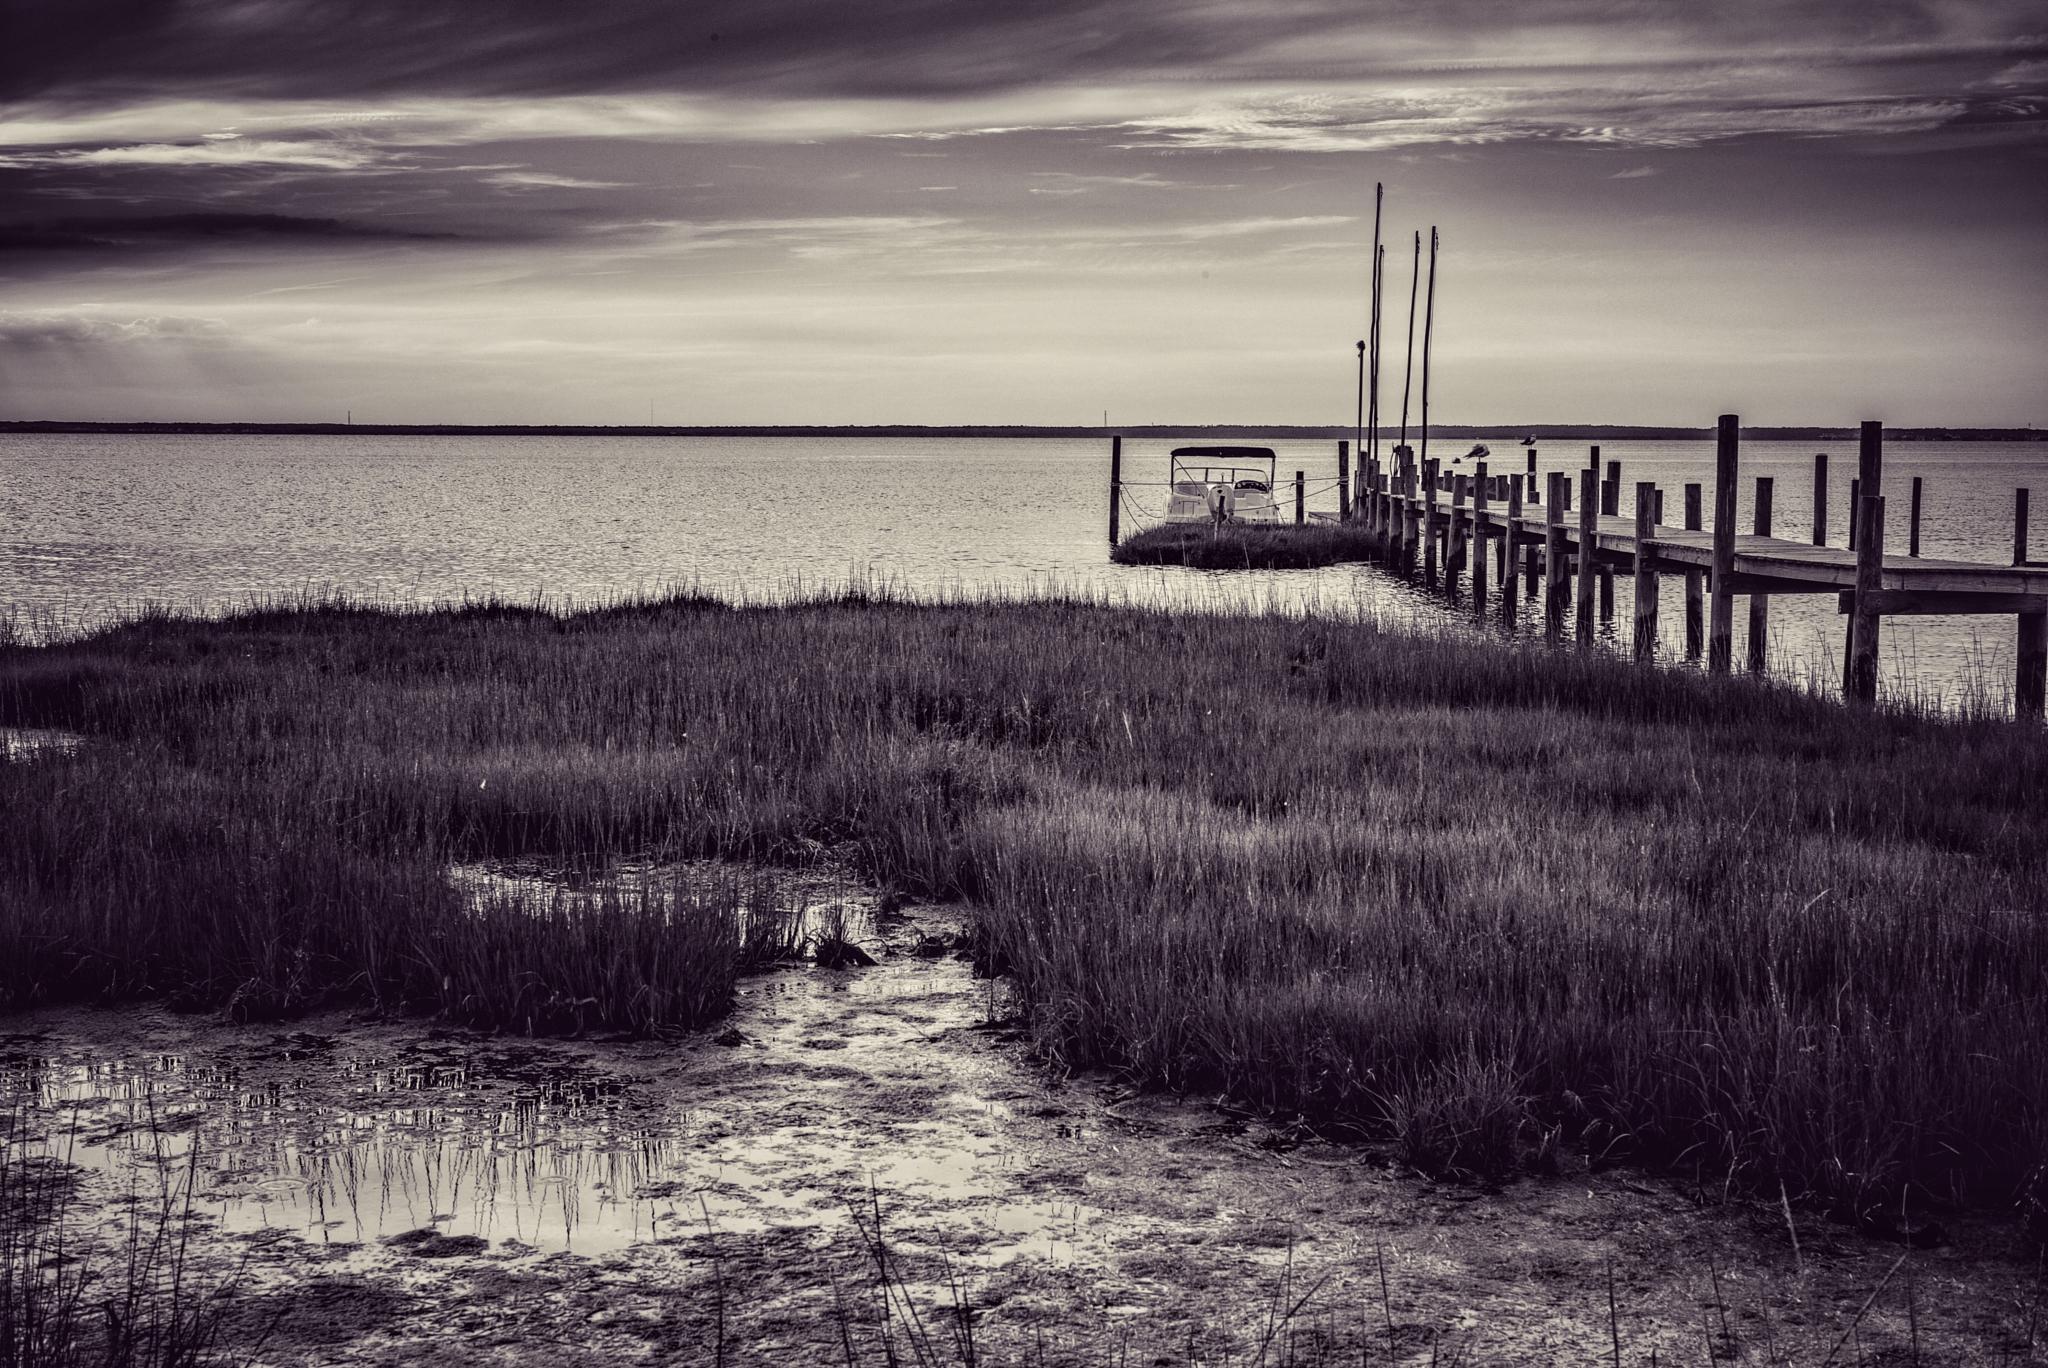 """Pier"", Barnegat Bay, New Jersey 2015 by hbenkel"